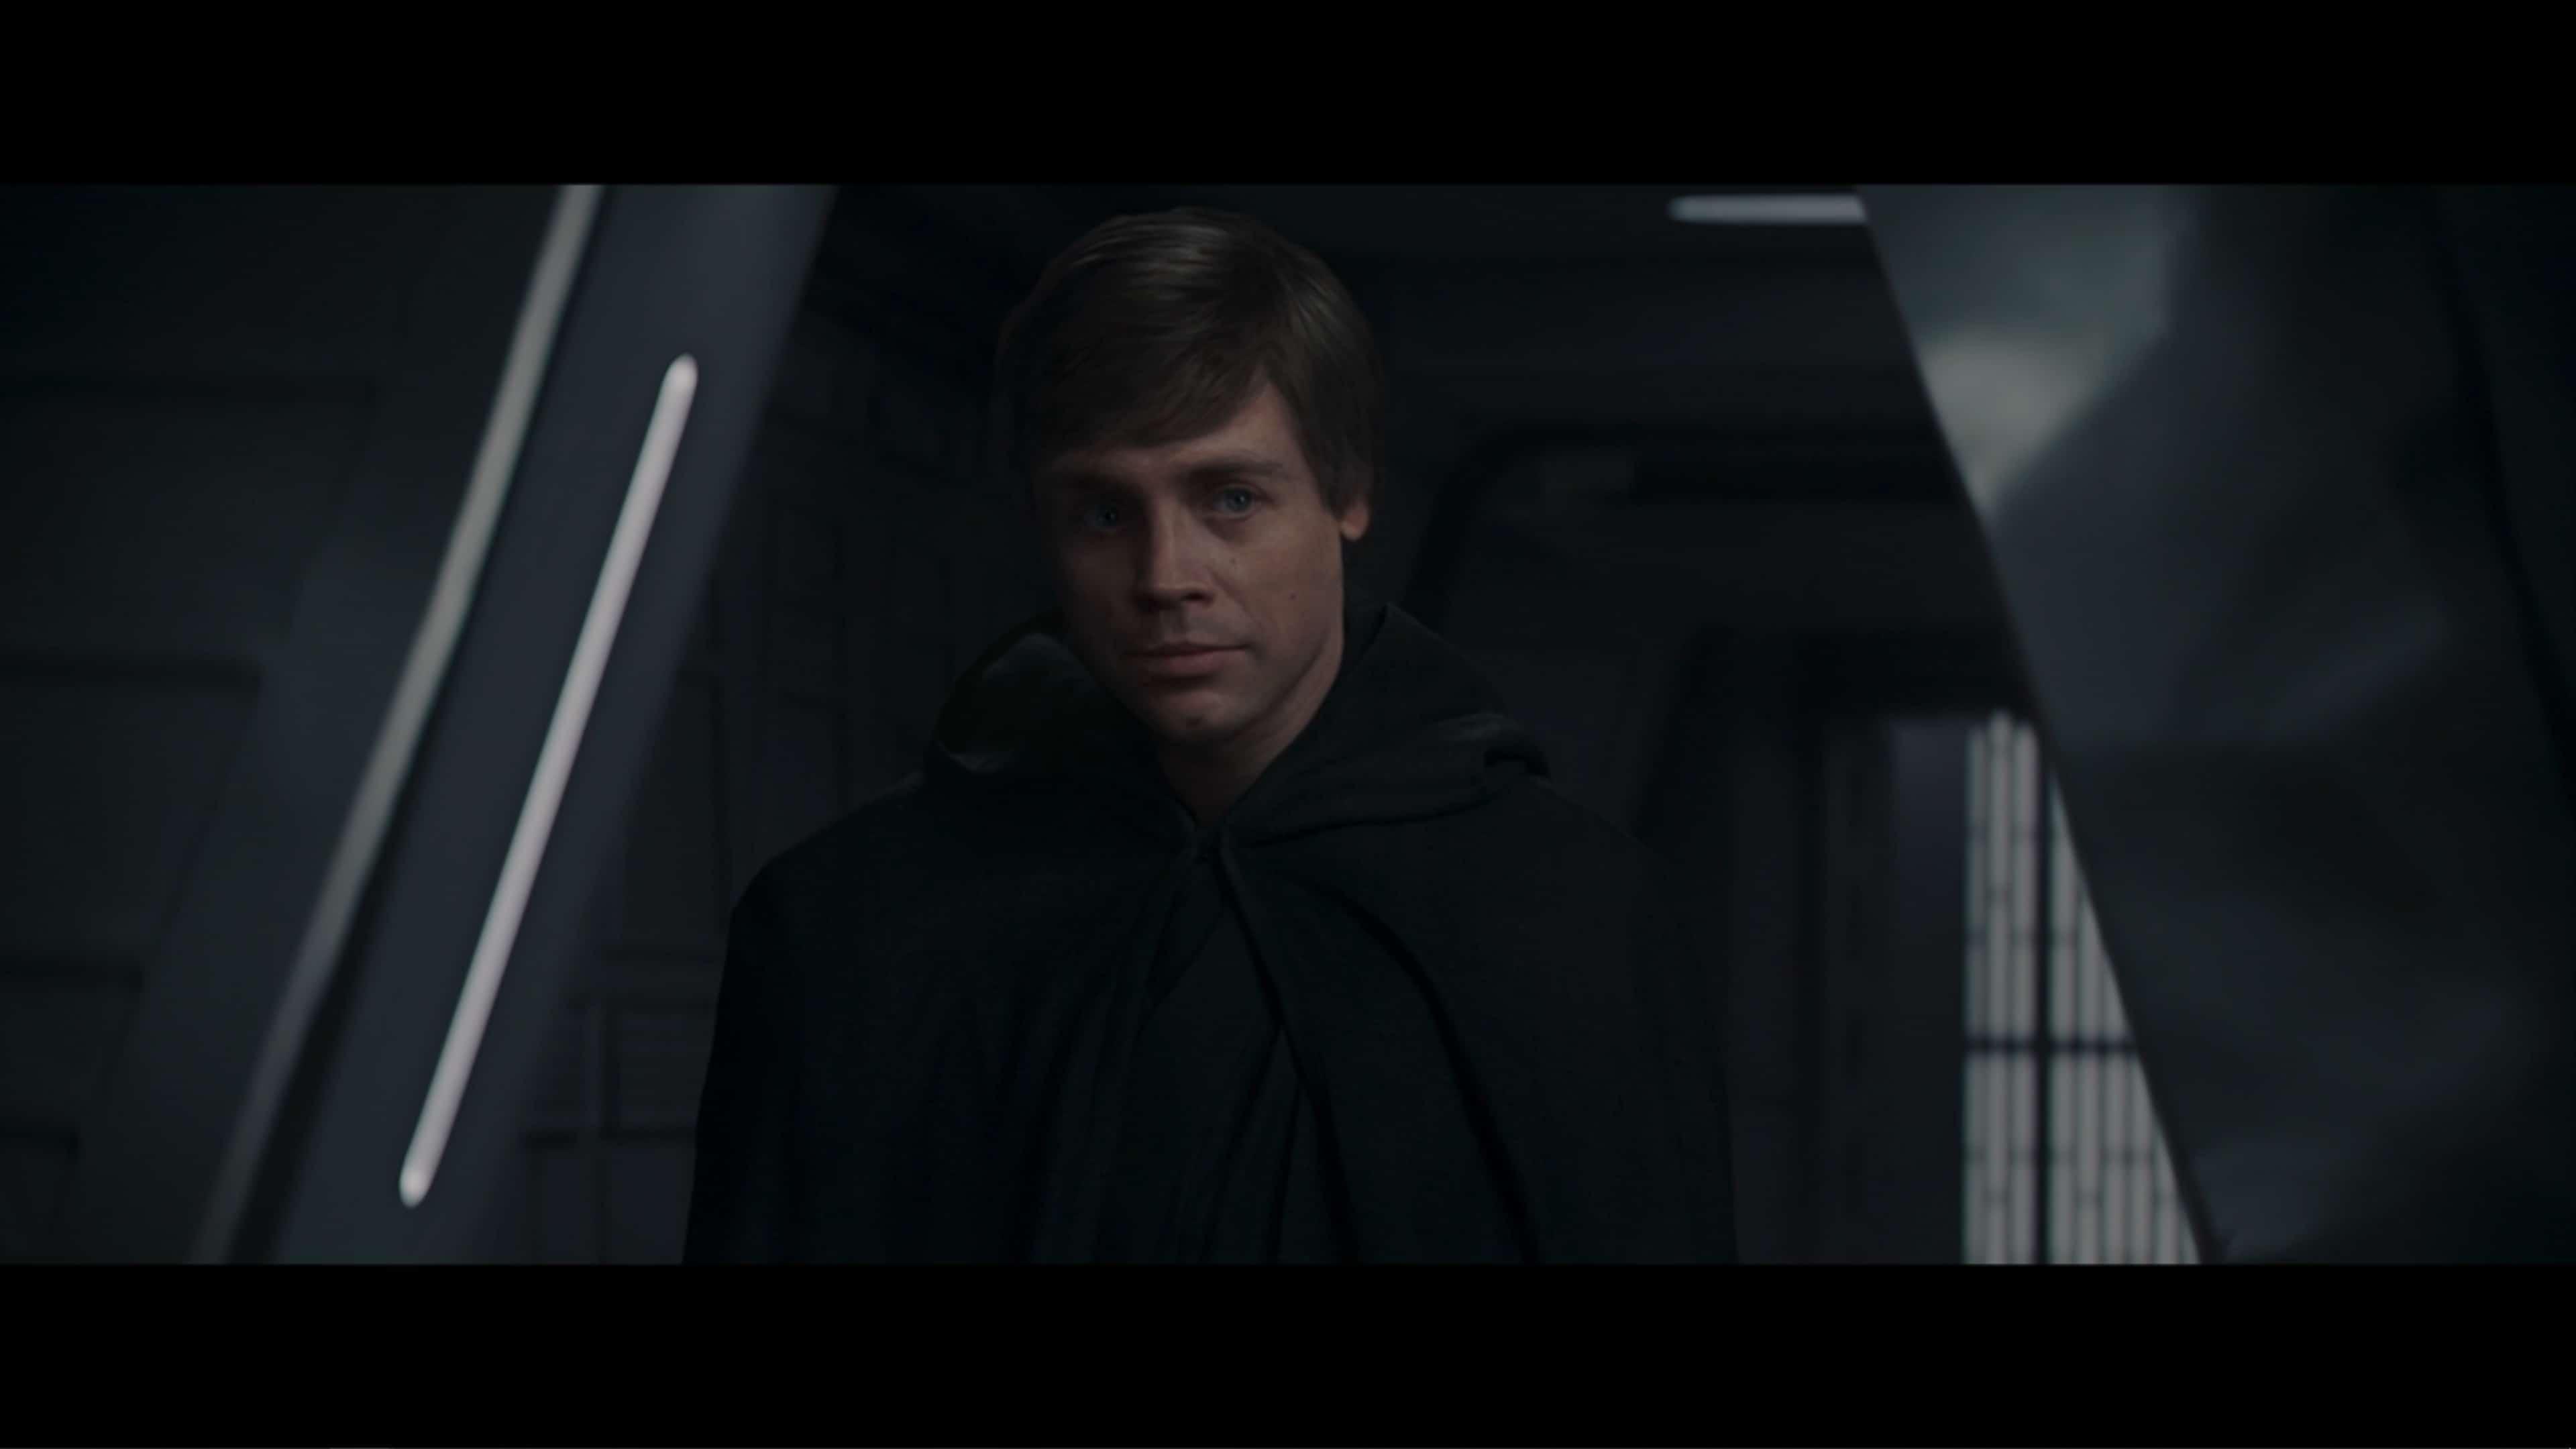 Luke Skywalker (Mark Hamill) revealing himself